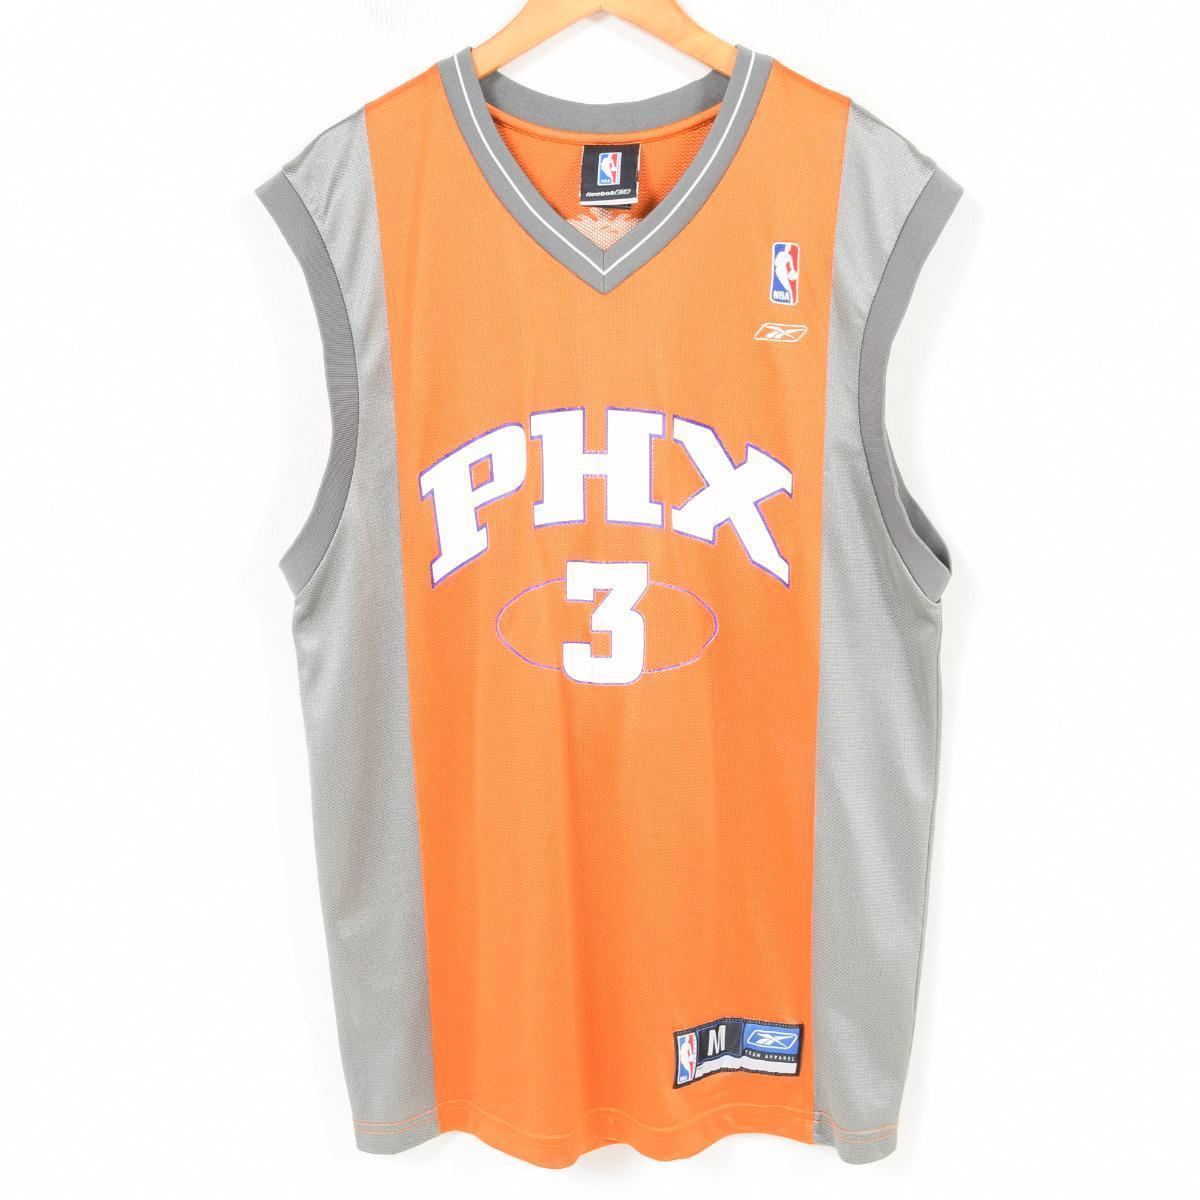 size 40 53bdb fad63 Reebok Reebok NBA PHOENIX SUNS Phoenix Suns Jason Richardson game shirt  replica uniform men M /wap1005